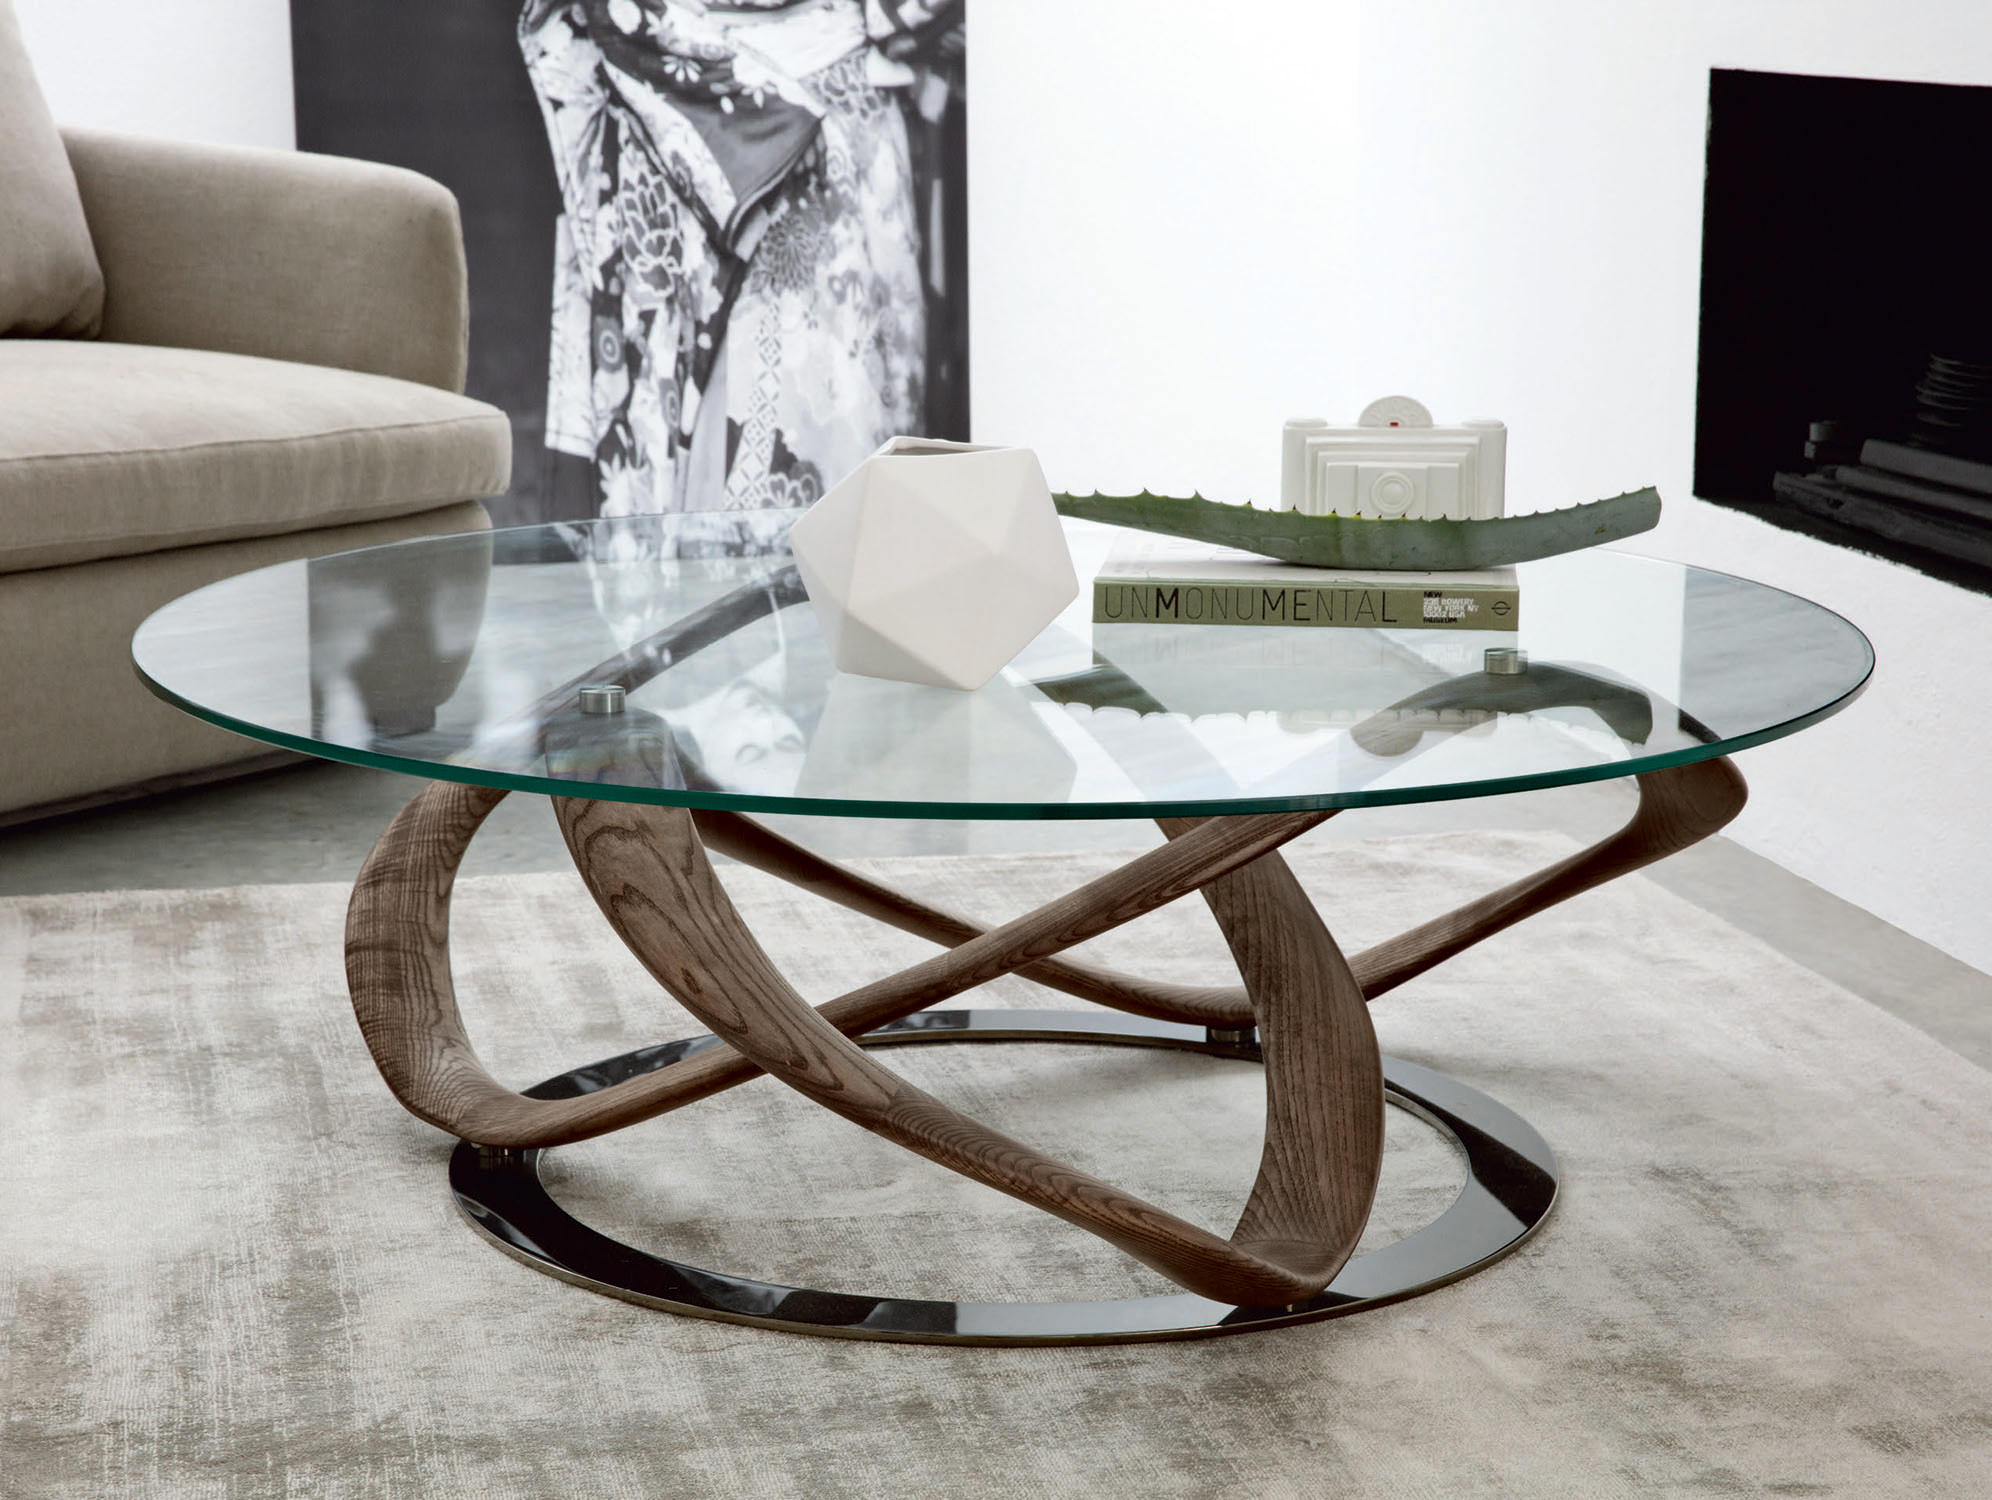 Infinity Tavolino By Porada